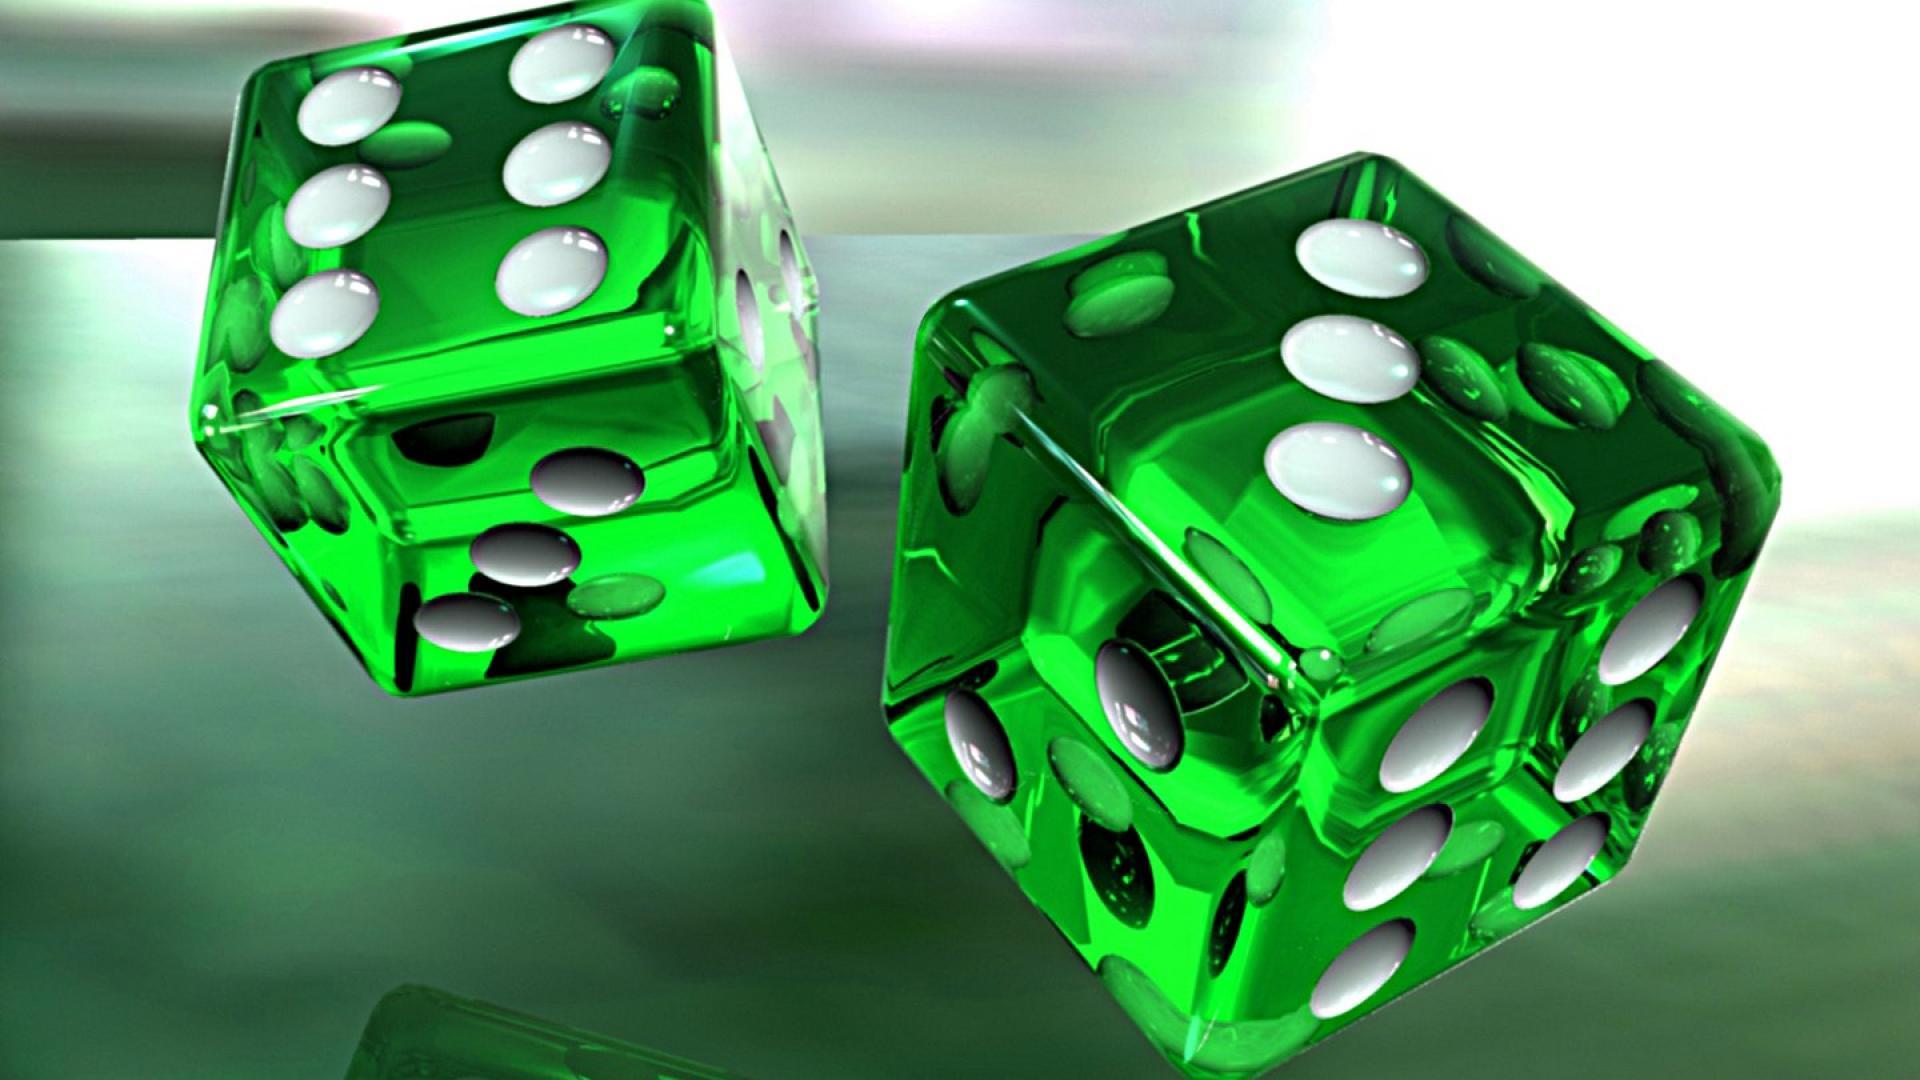 Cube 3d Image Hd